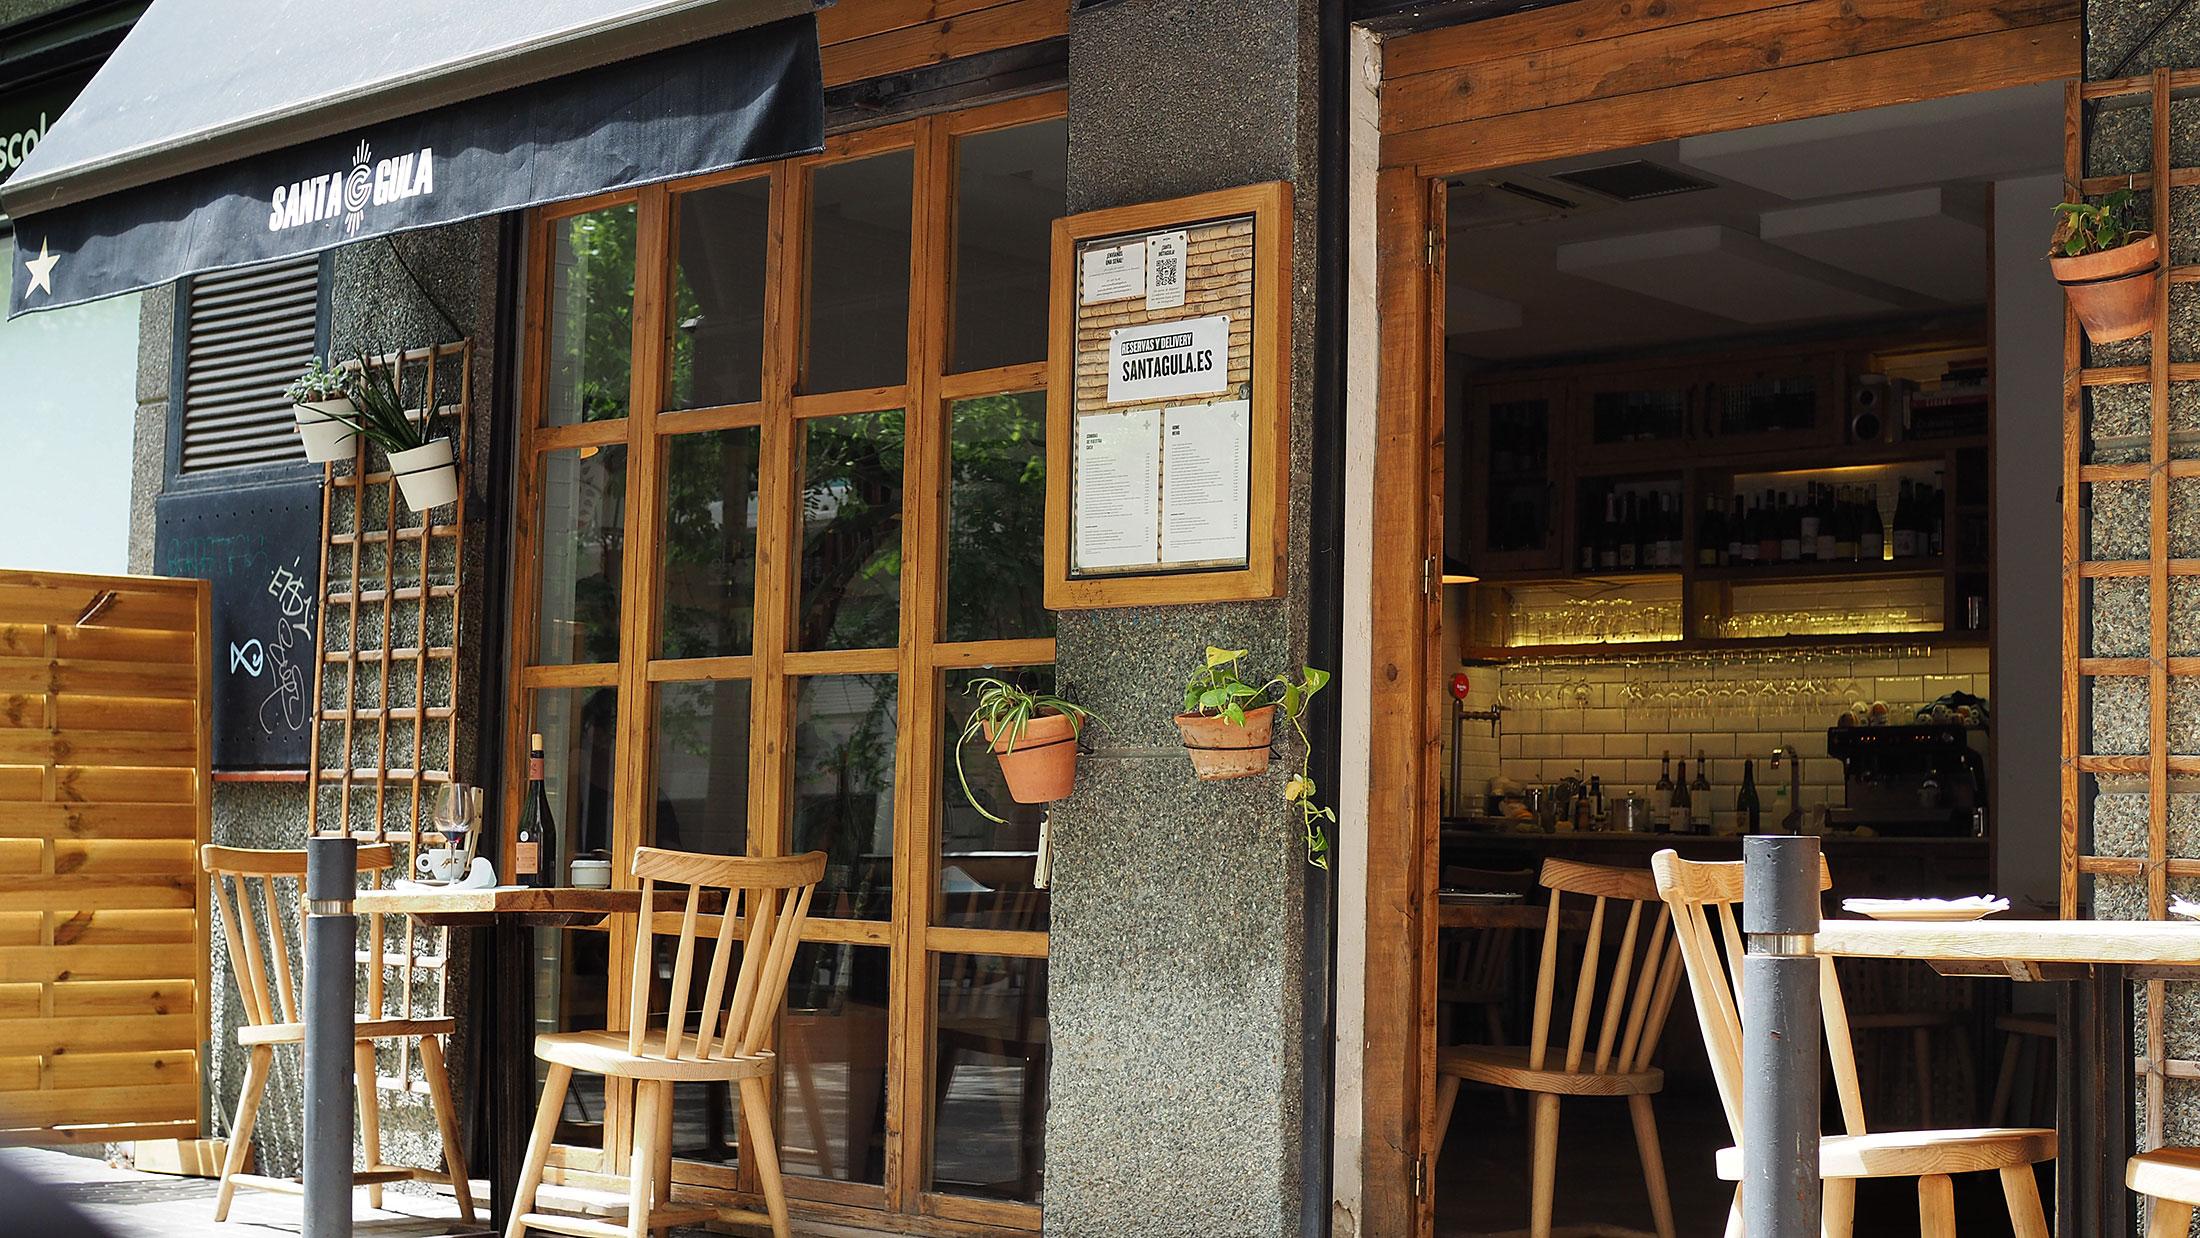 Restaurante Santa Gula tapas Barcelona